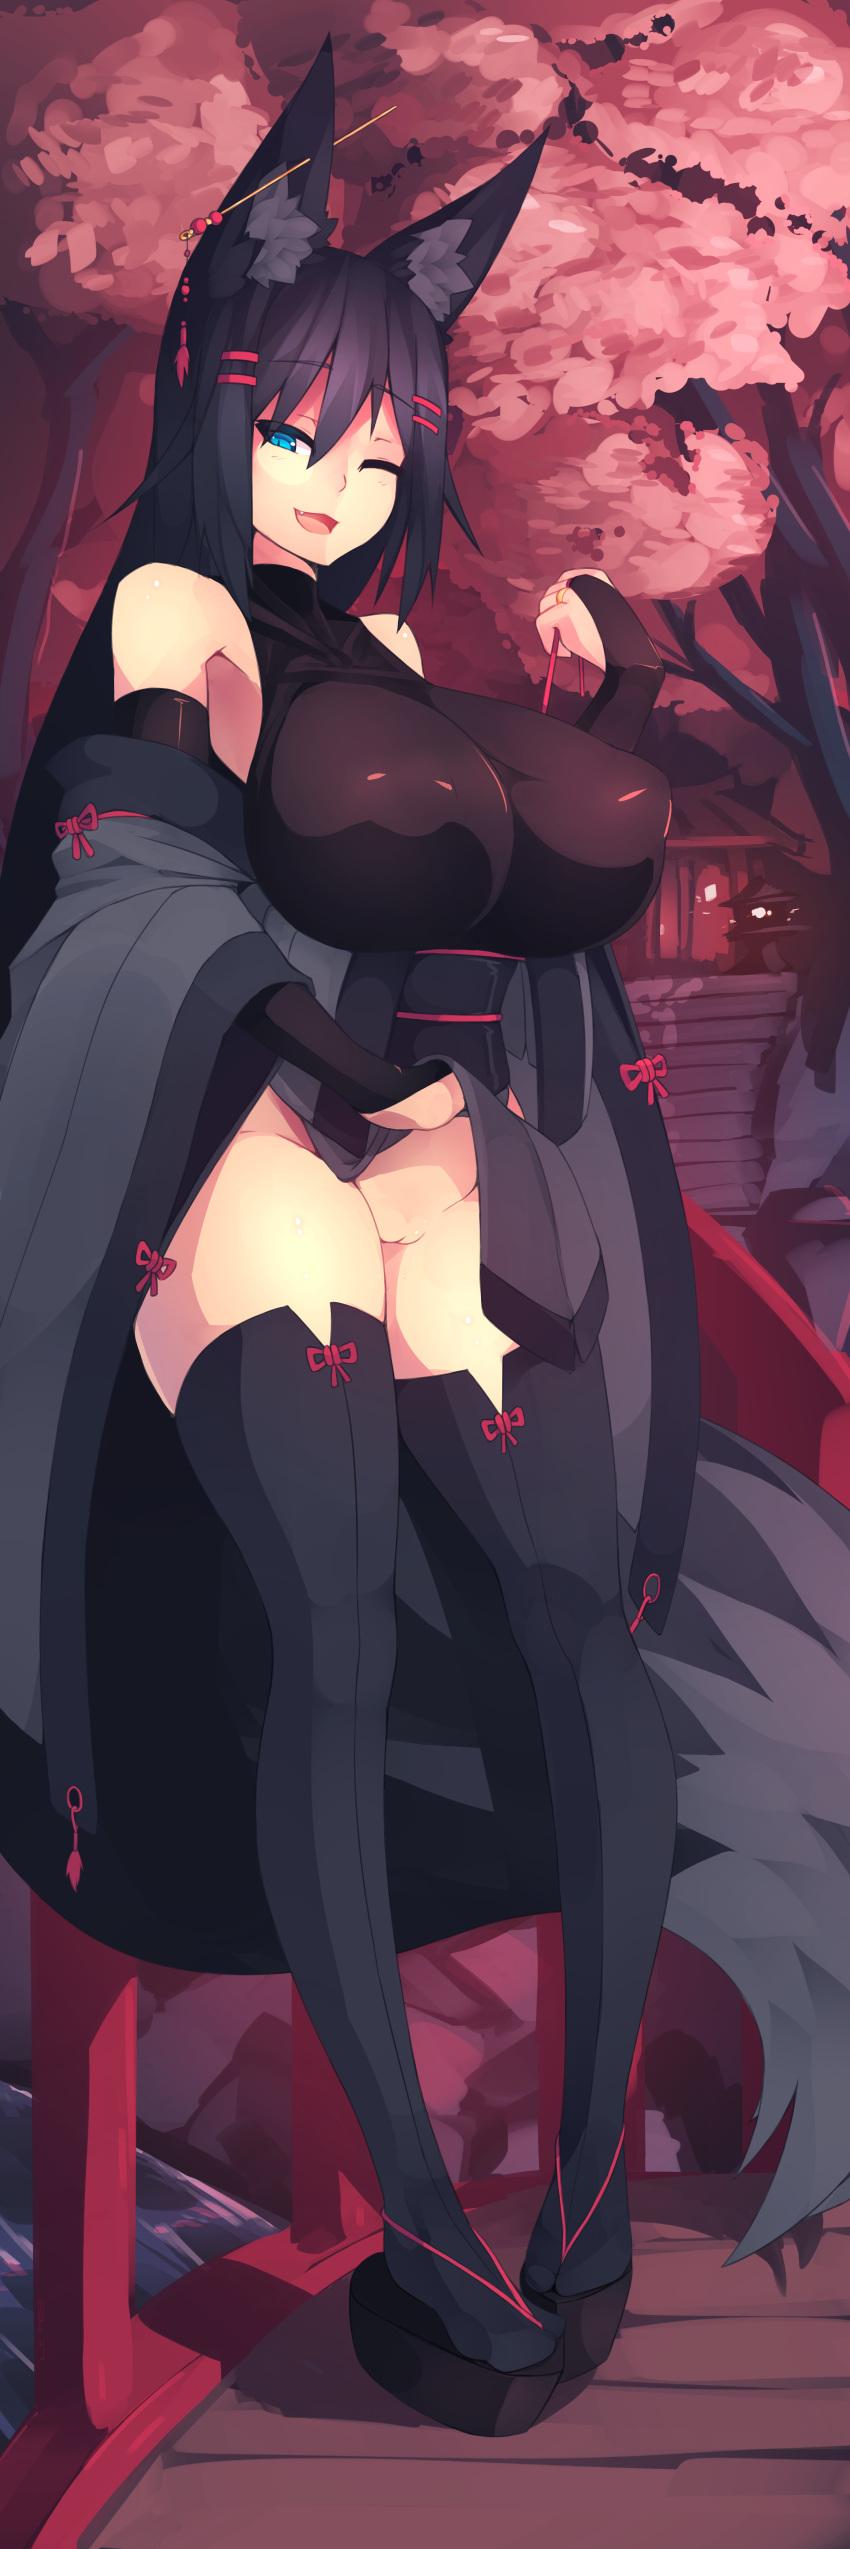 hentai end death quest re One piece hentai nico robin